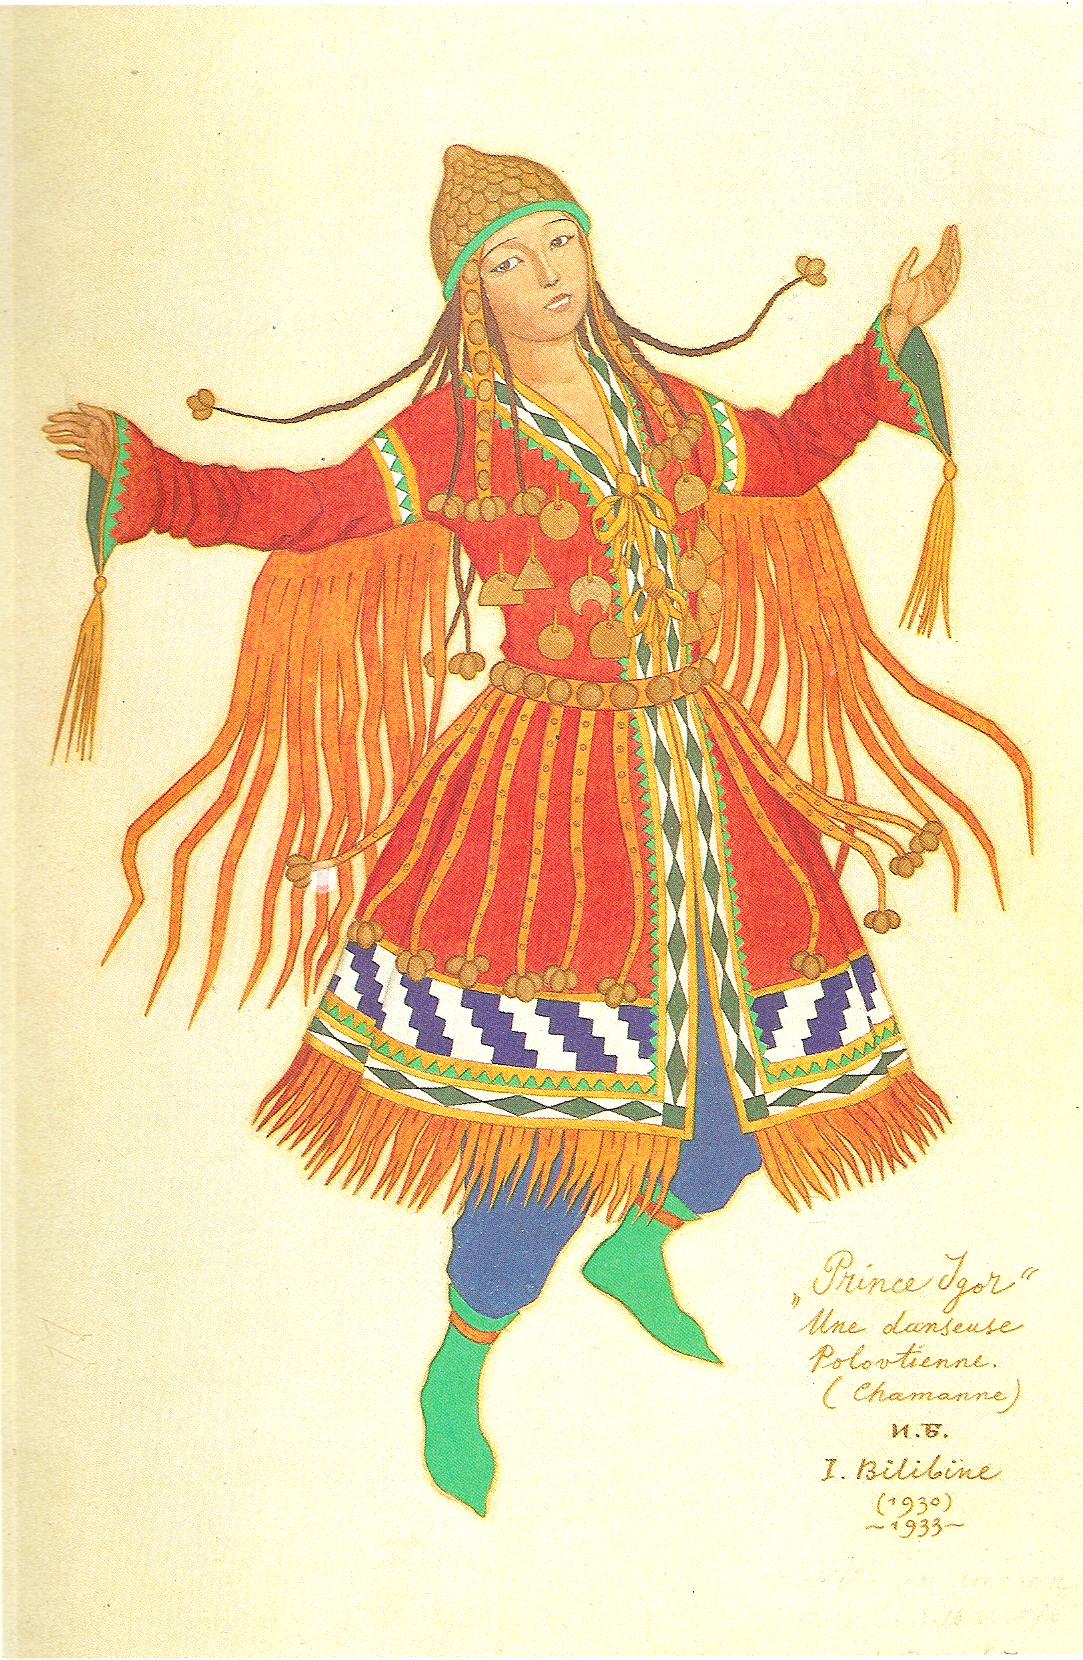 Ivan Bilibine 1930 Dance costume